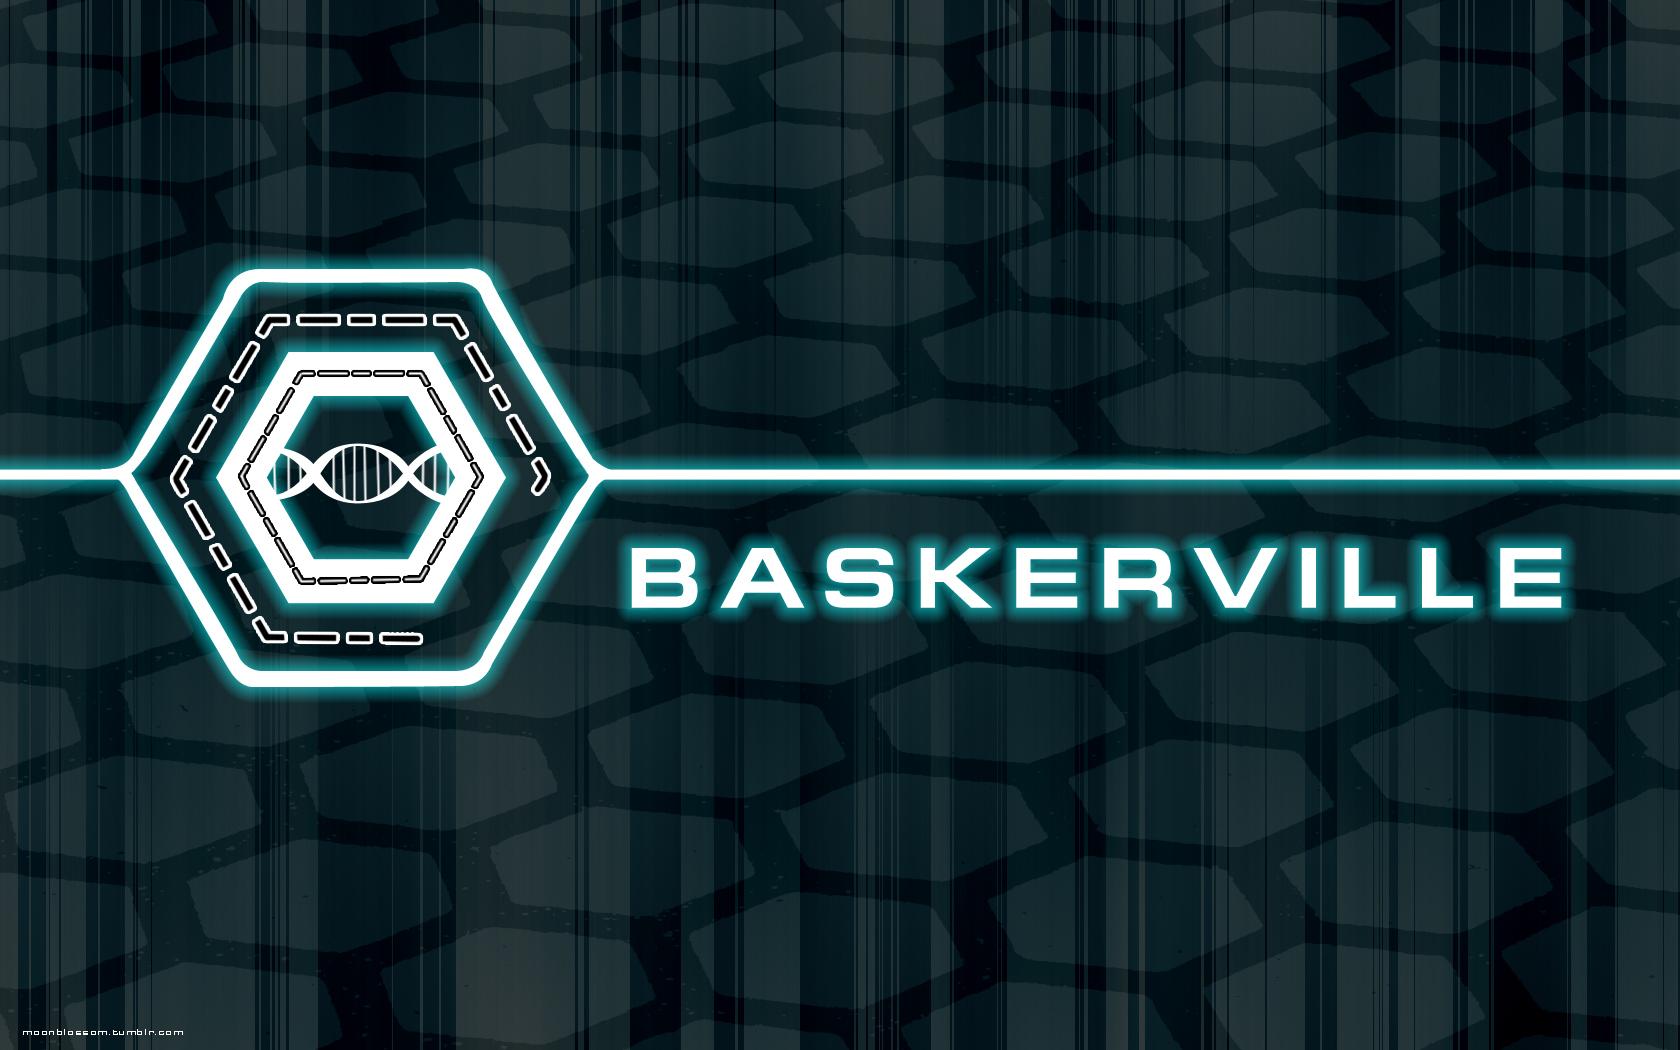 Moonblossom Baskerville